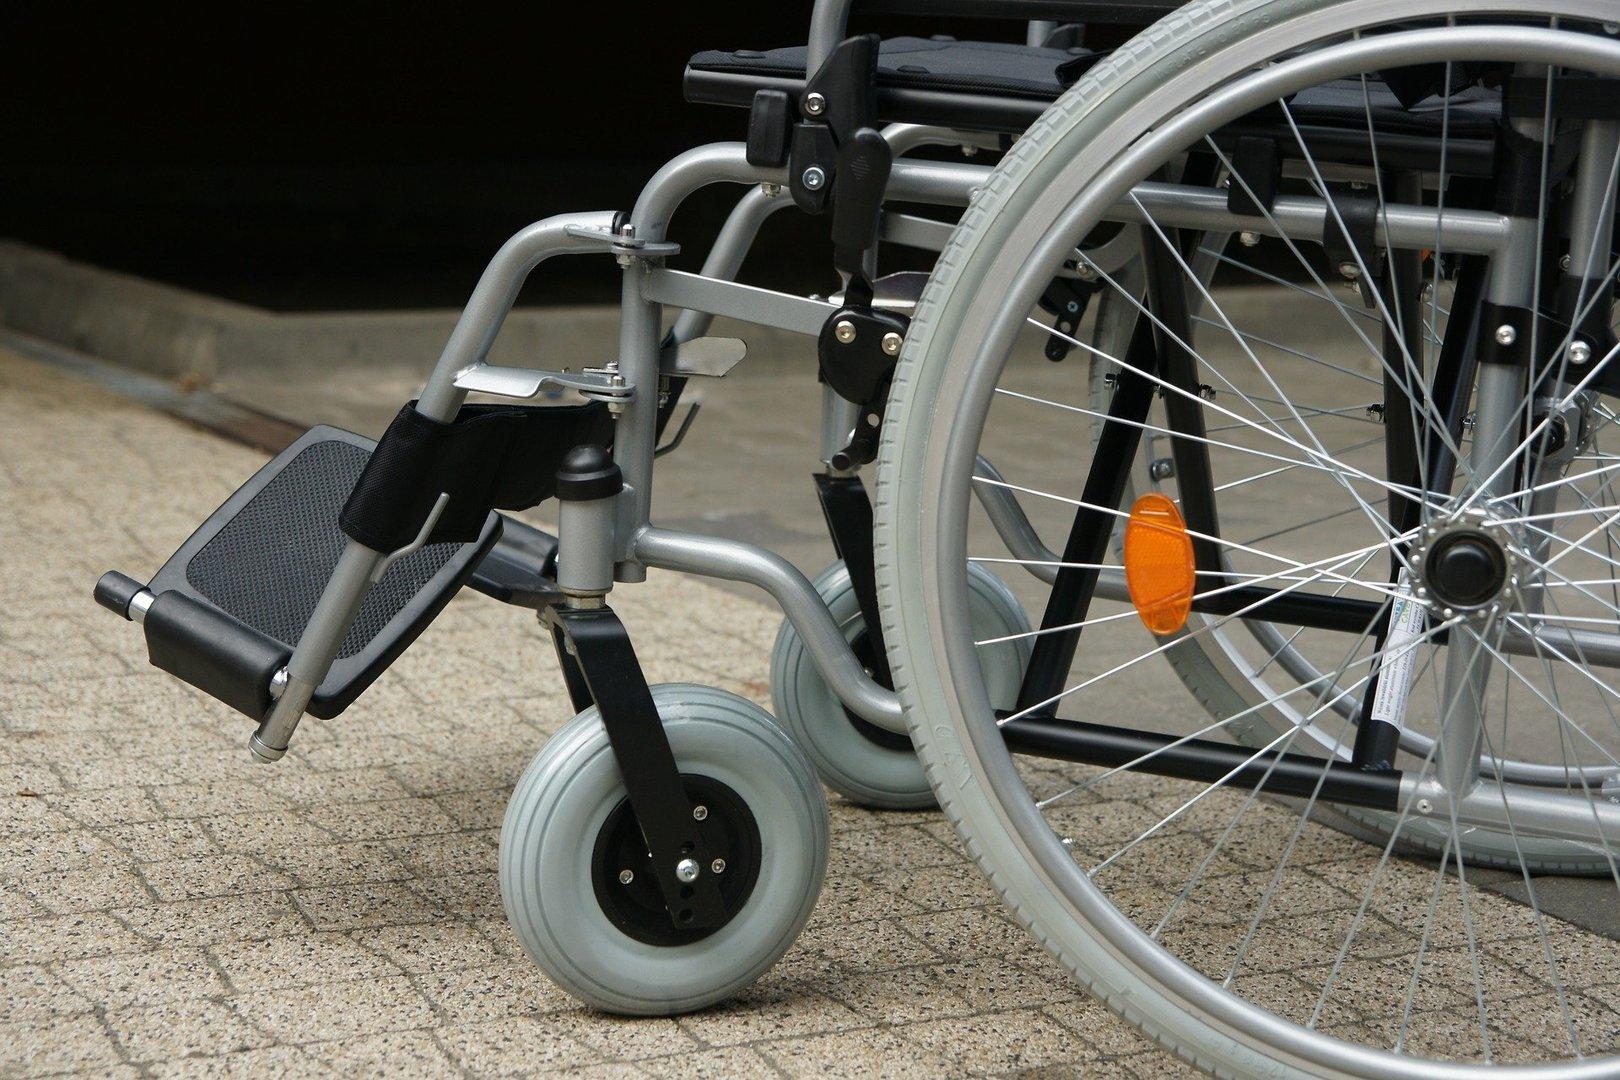 Wózek inwalidzki.